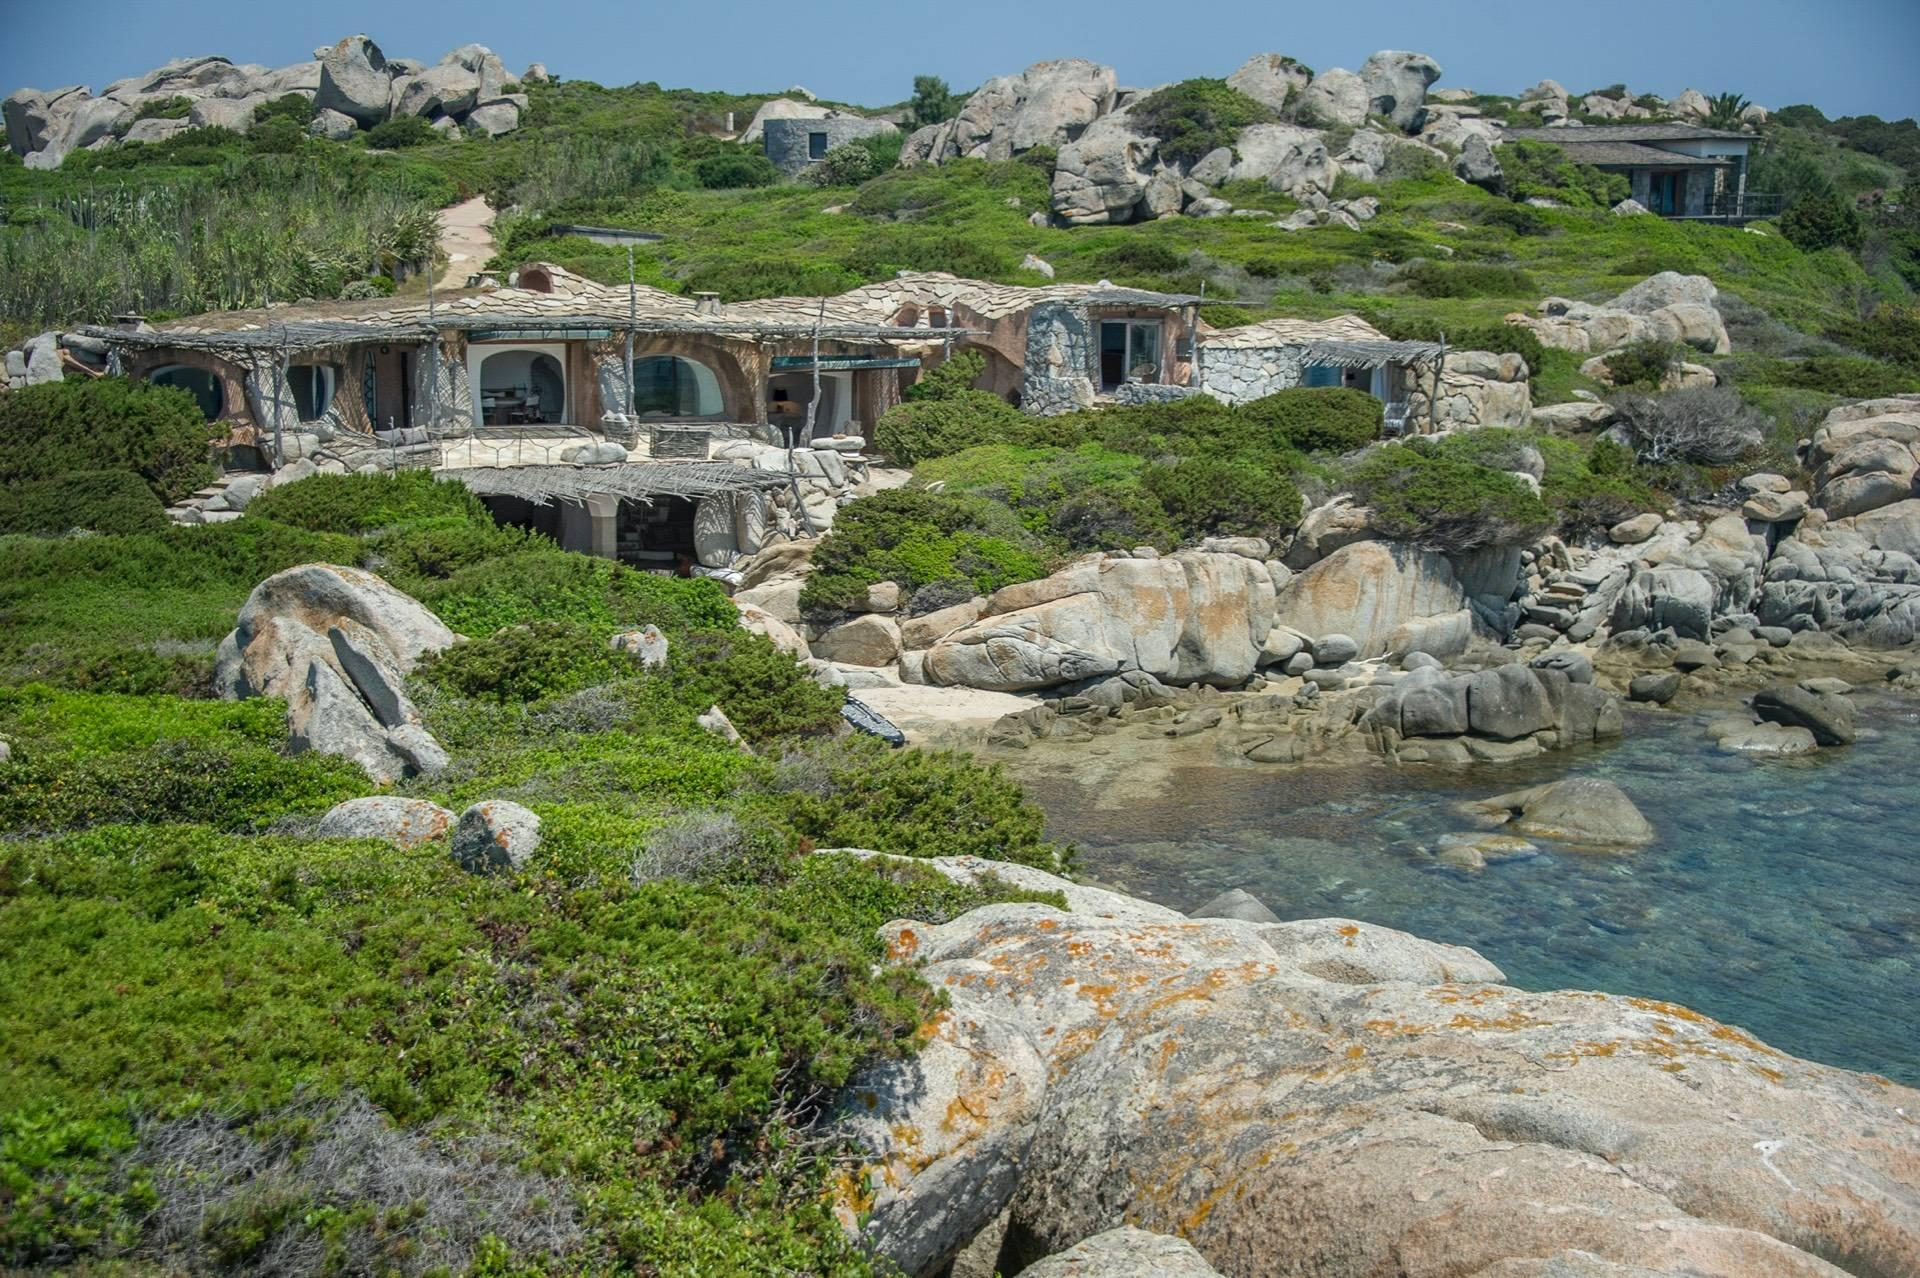 Iconica villa pieds dans l'eau all'ile de Cavallo - 18